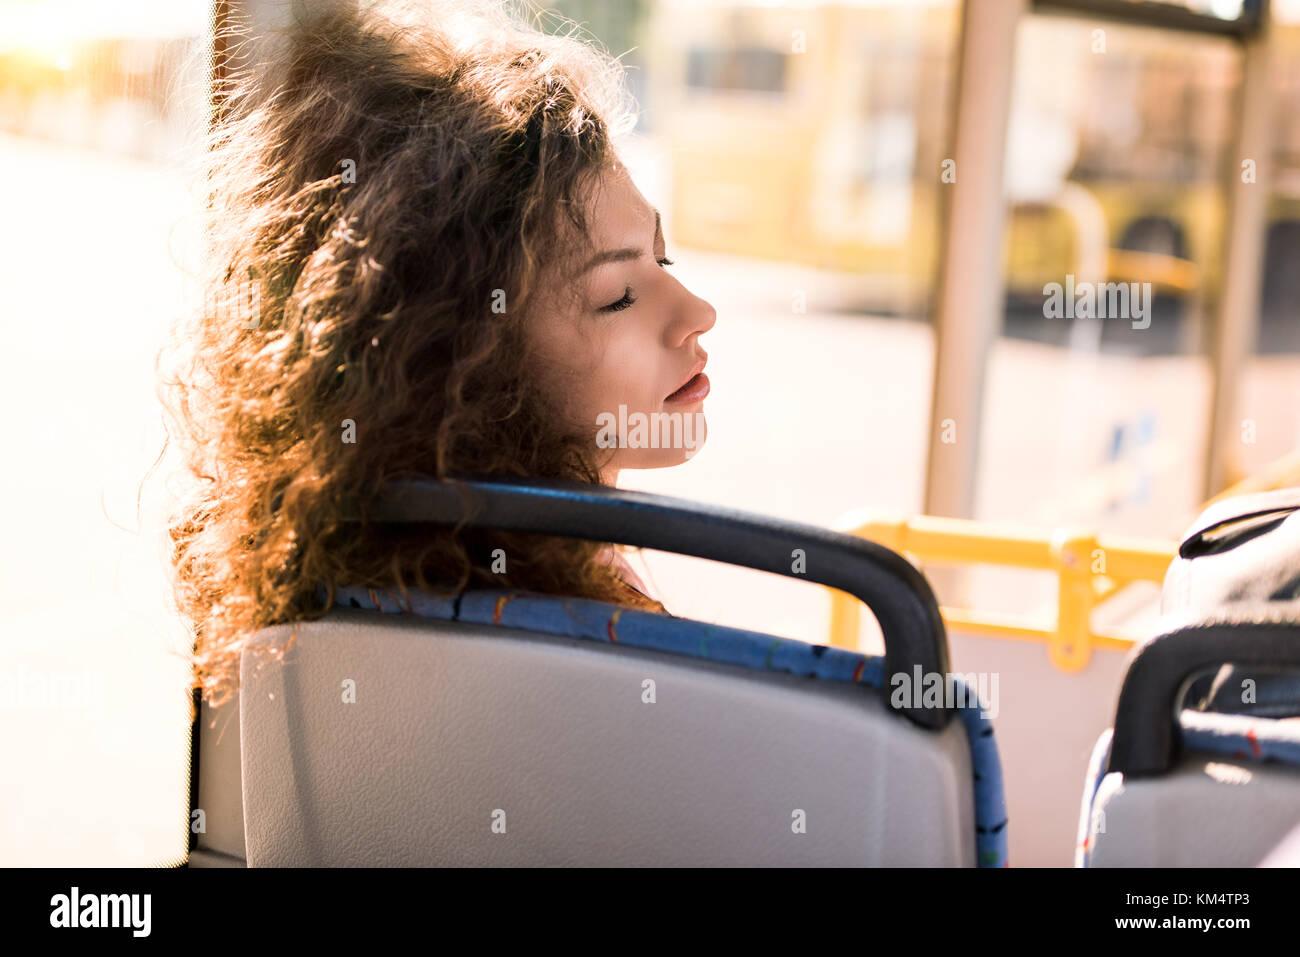 Girl sleeping in bus Photo Stock